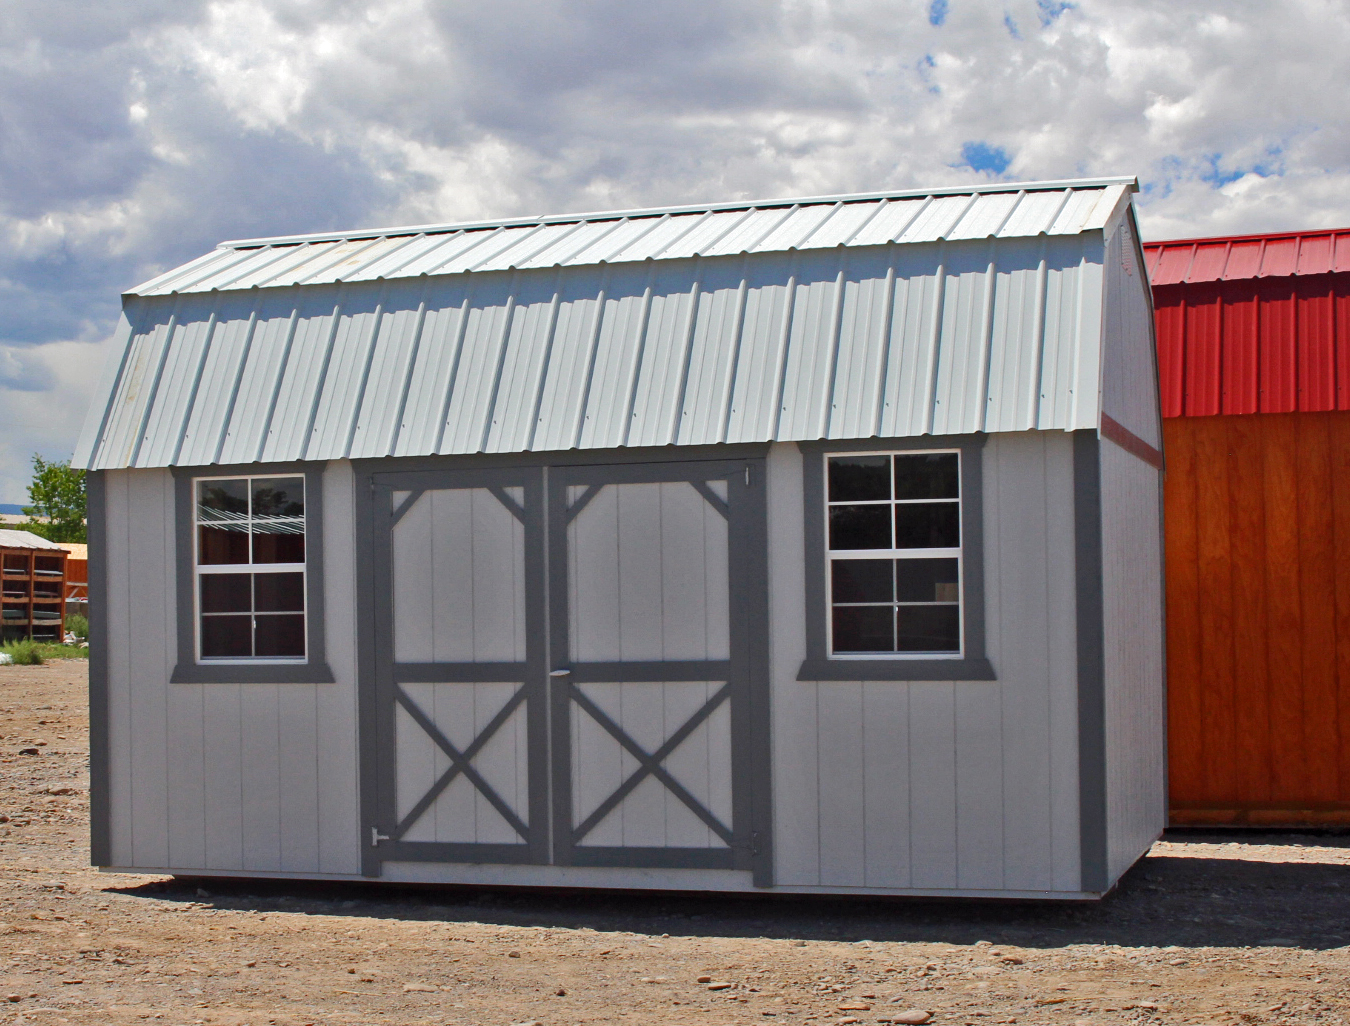 Painted Side Lofted Barn Shed - Vegas Sheds